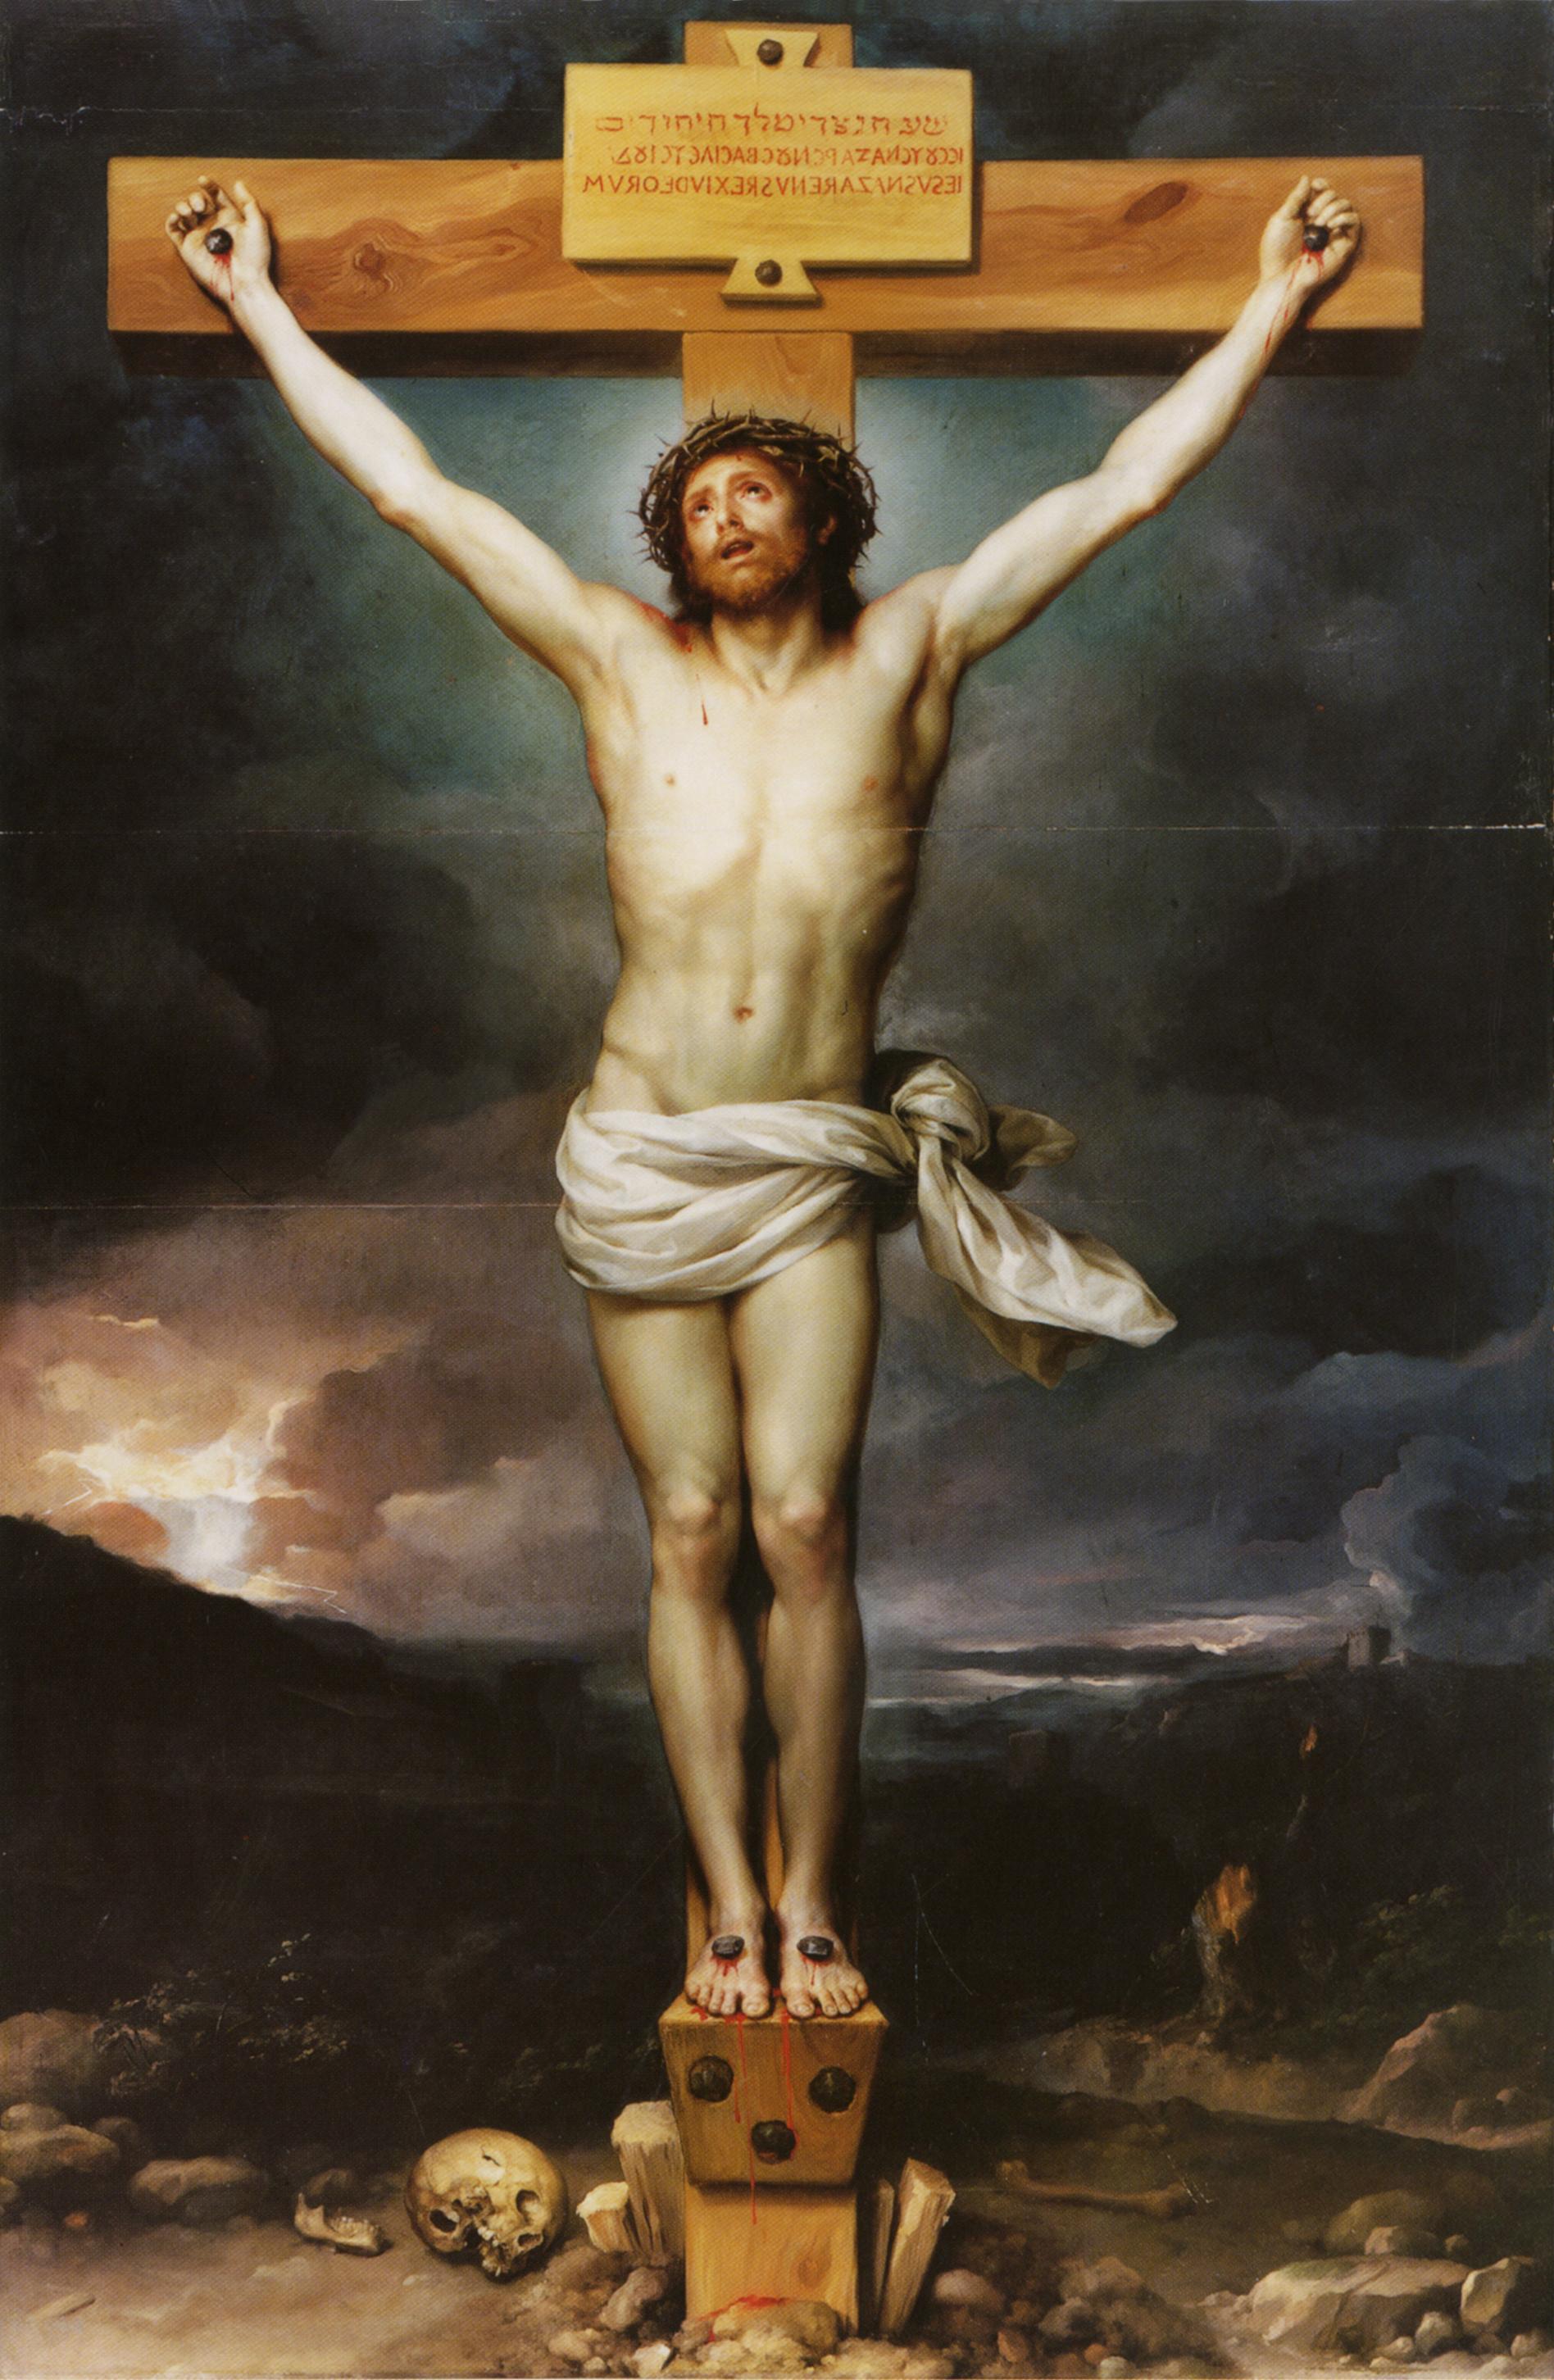 Znalezione obrazy dla zapytania Chrystus obraz